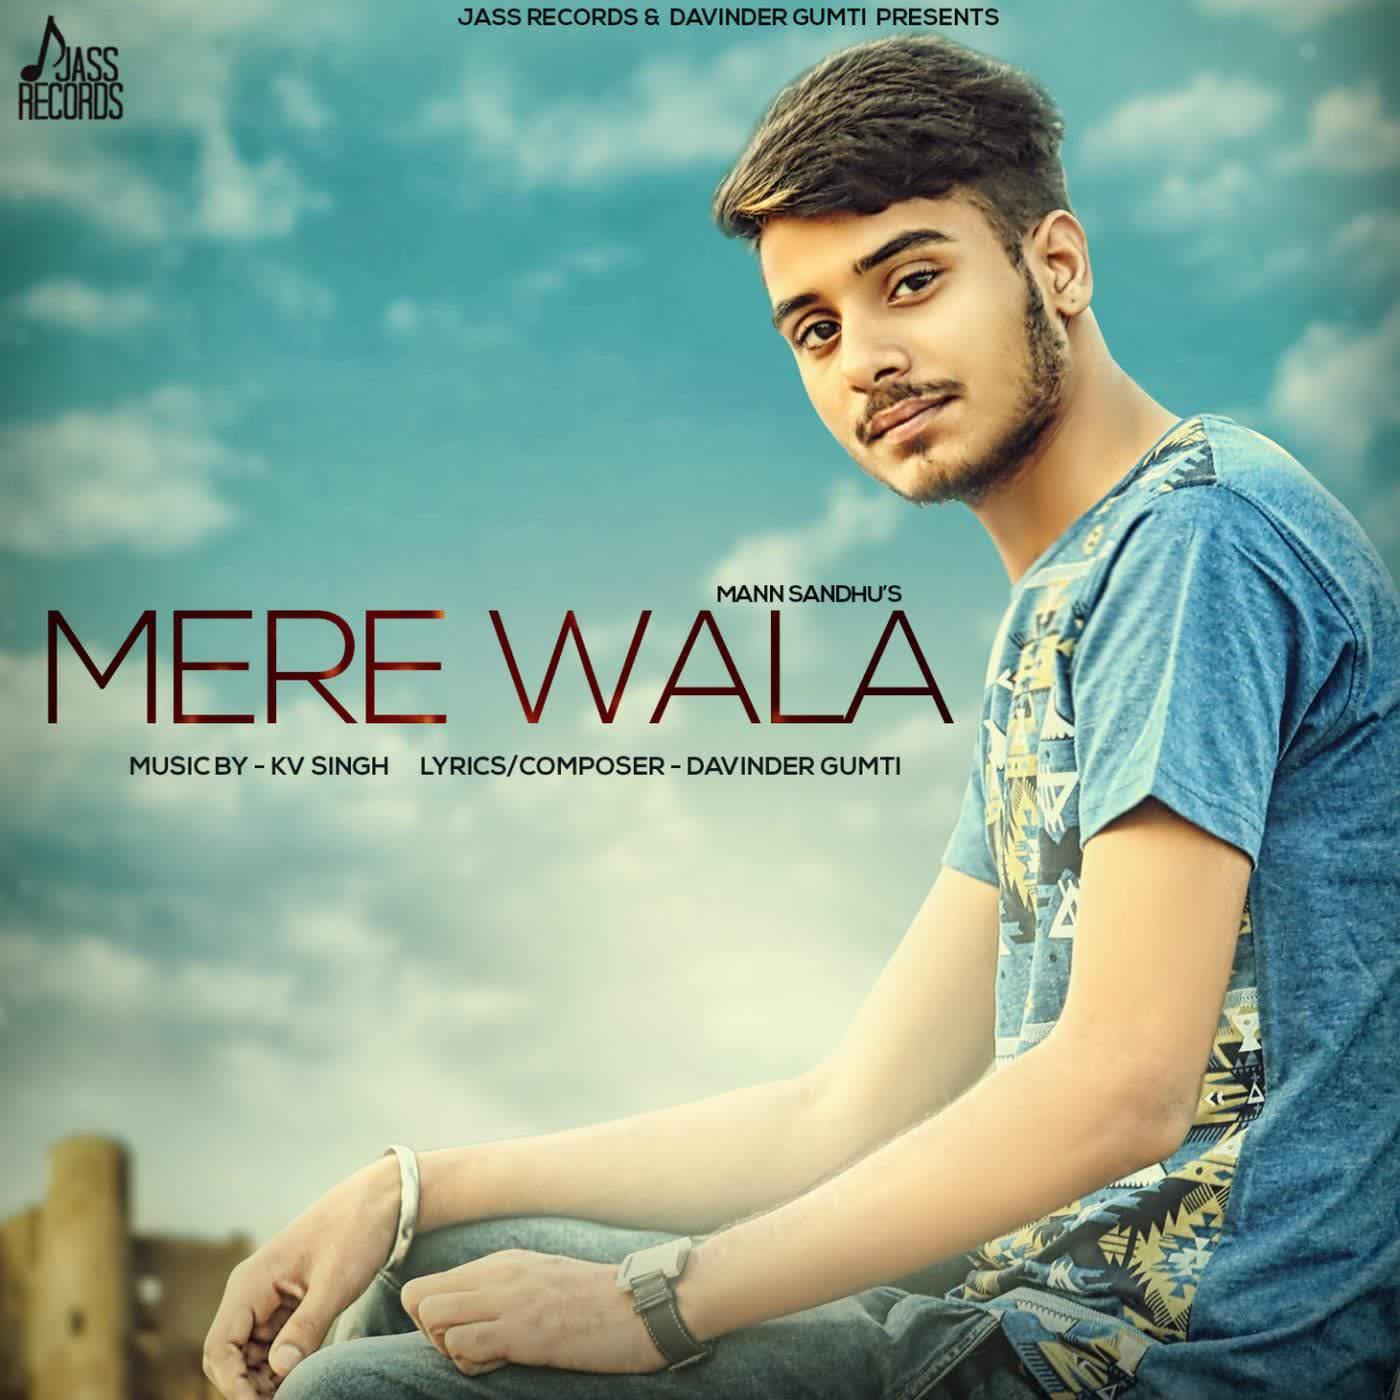 https://cover.djpunjab.org/36791/300x250/Mere_Wala_Mann_Sandhu.jpg